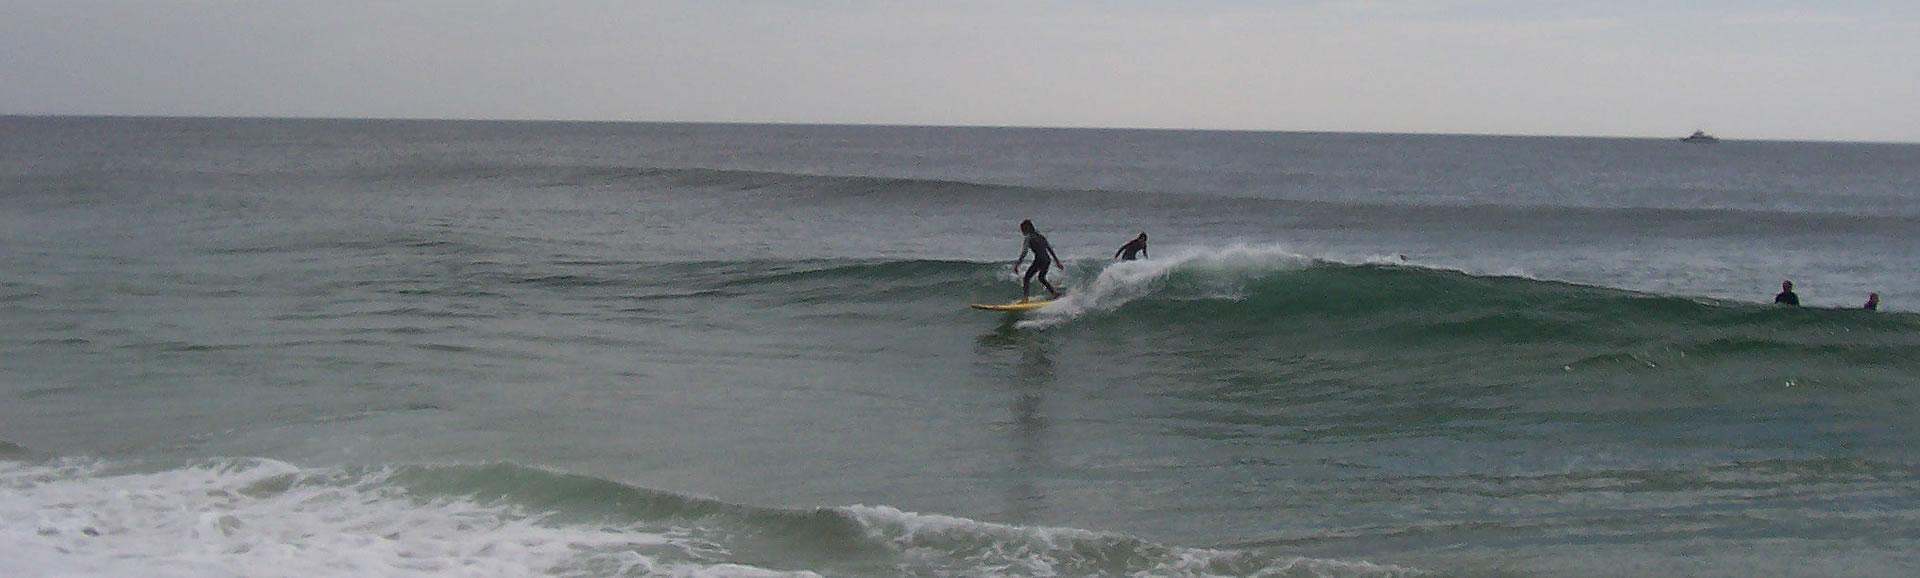 0c6e5cccf1 Kid Surfing Distance - Coastline AdventuresCoastline Adventures